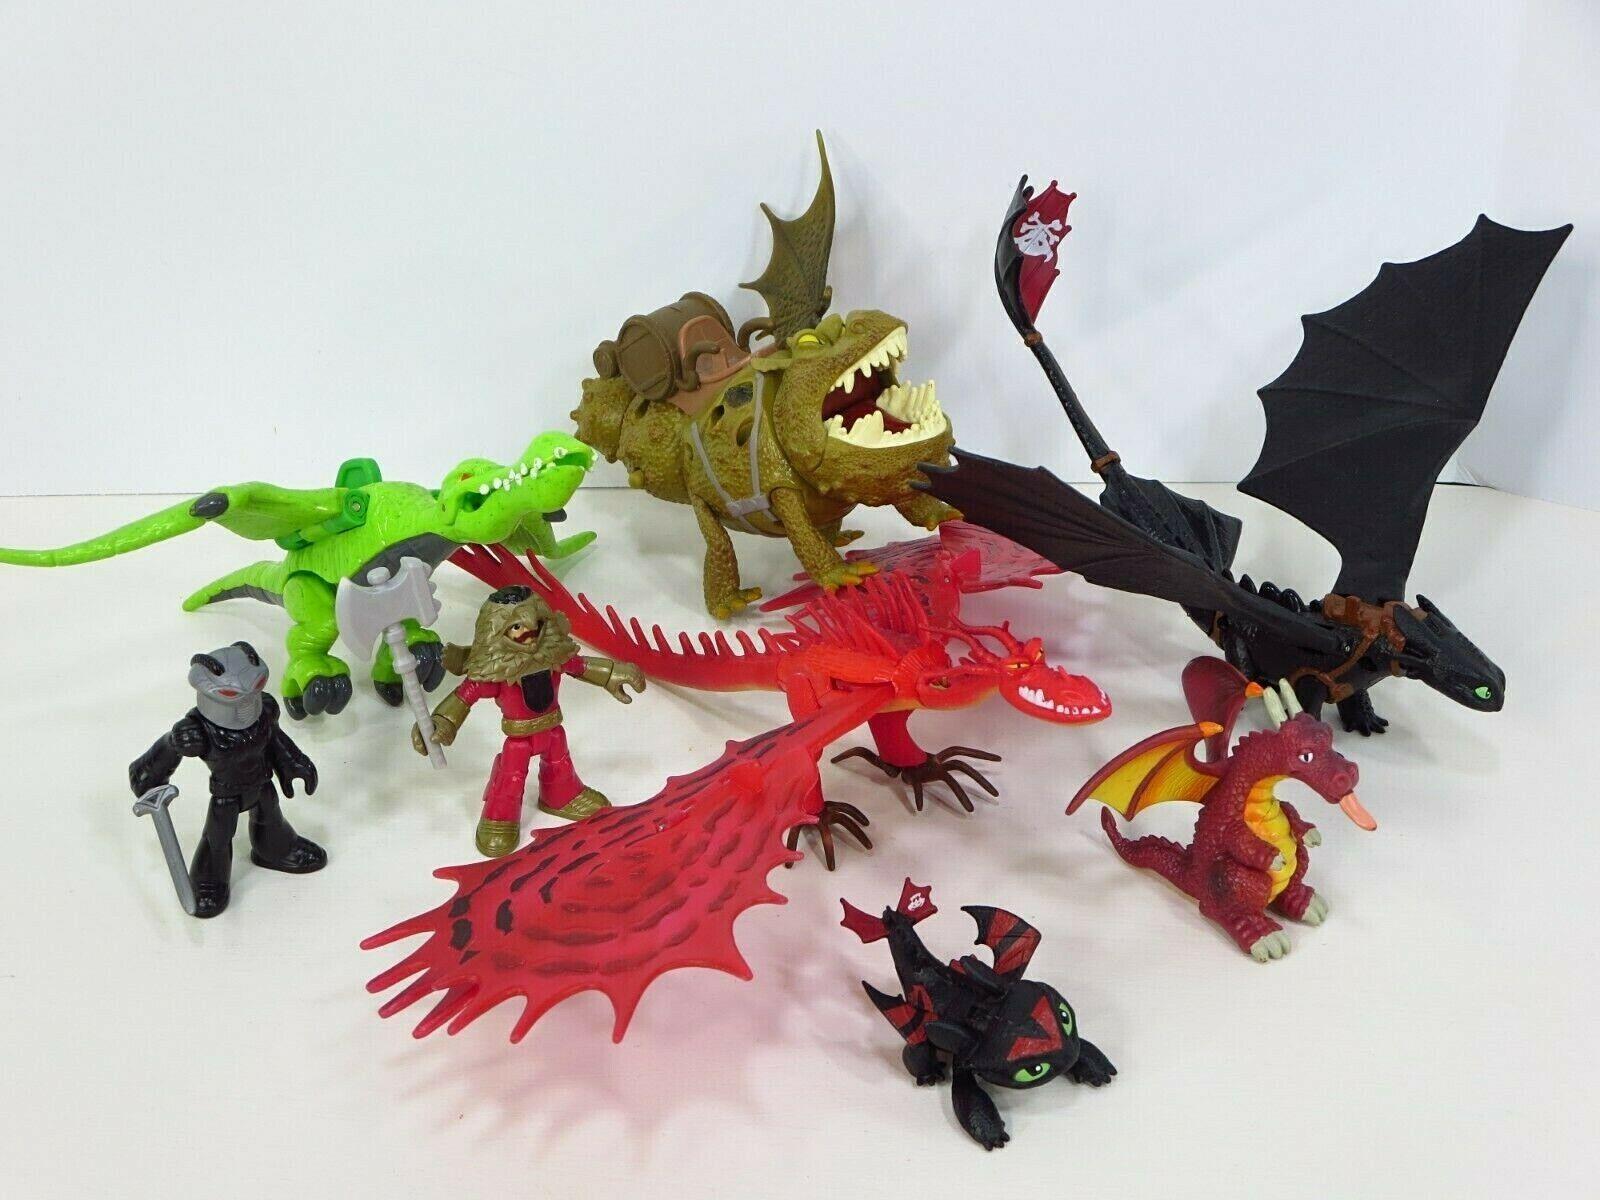 How to Train Your Dragon Hookfang Grump Toothless Figures Defenders Berk Lot